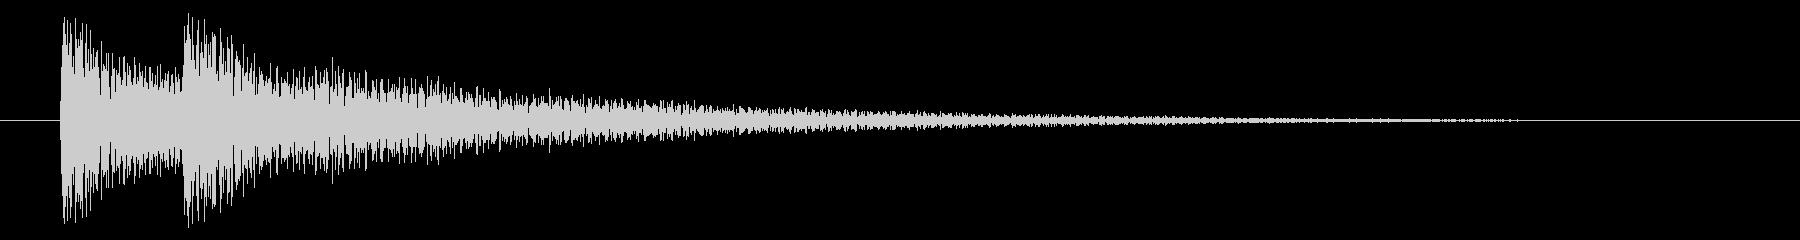 SF/ピコン↓/電子/決定音の未再生の波形